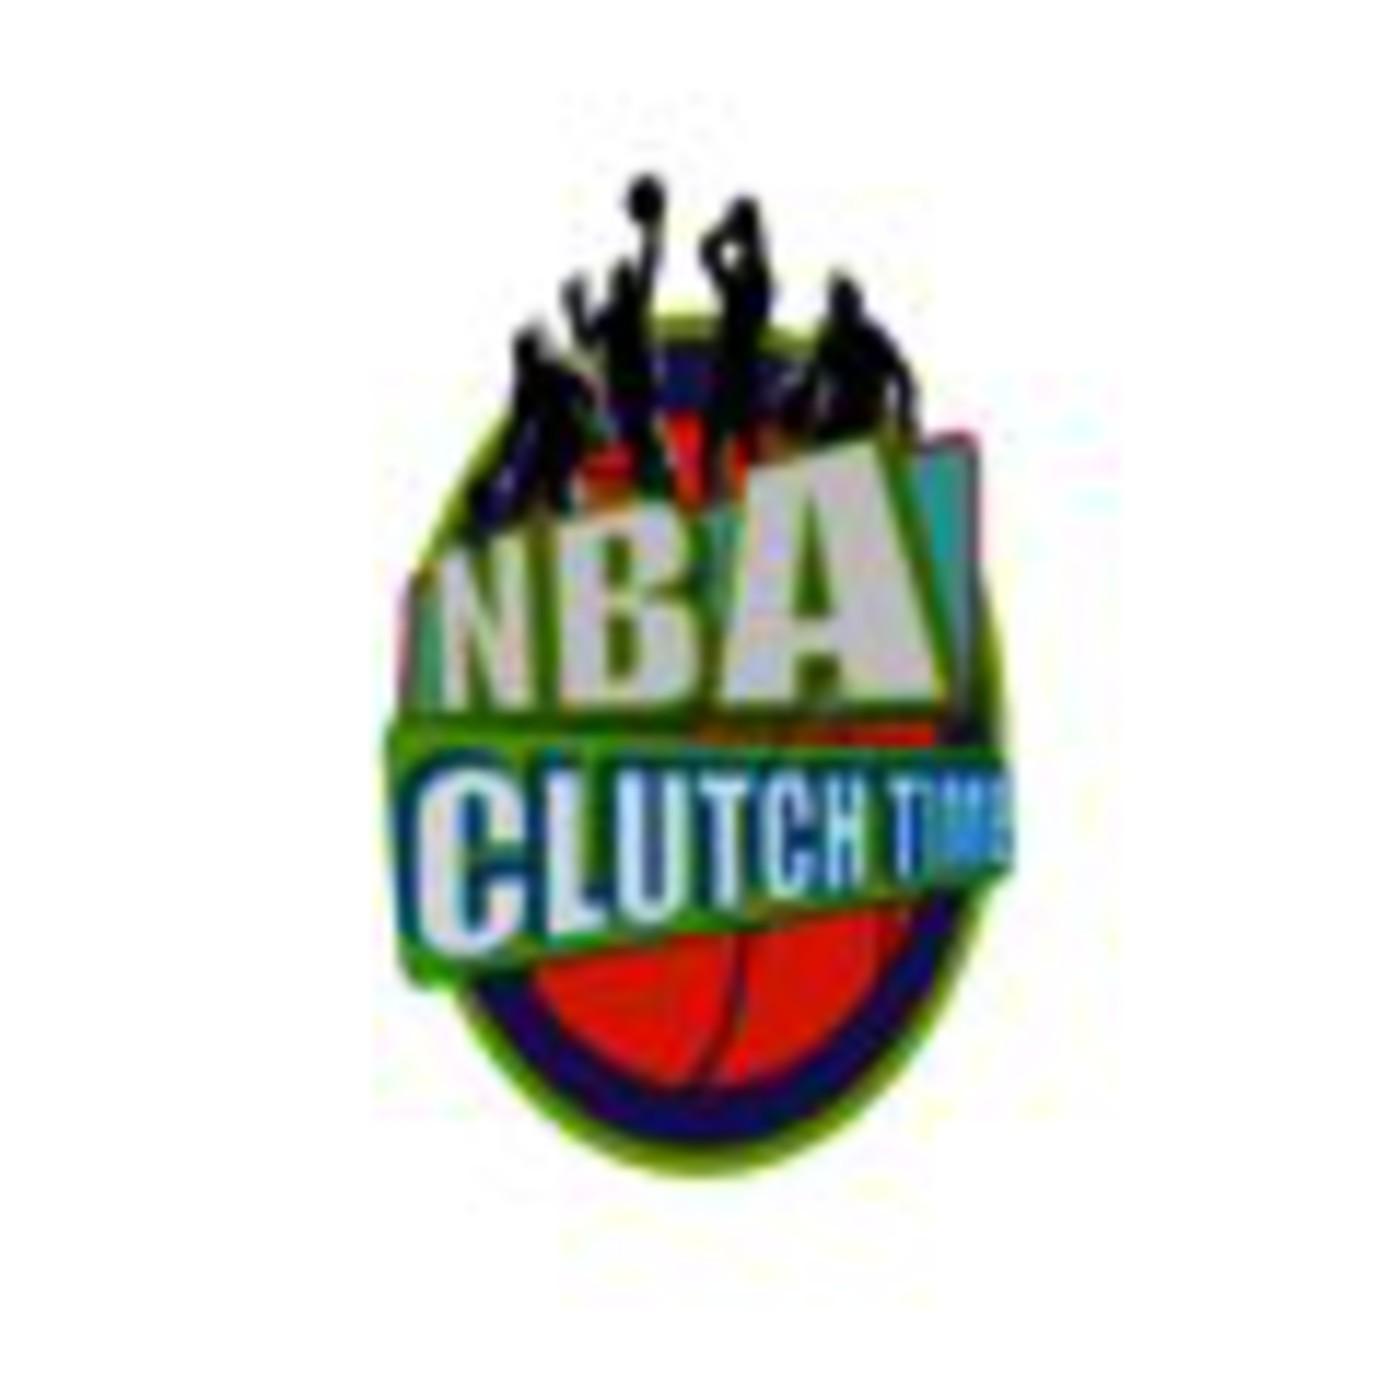 NBAClutchTime